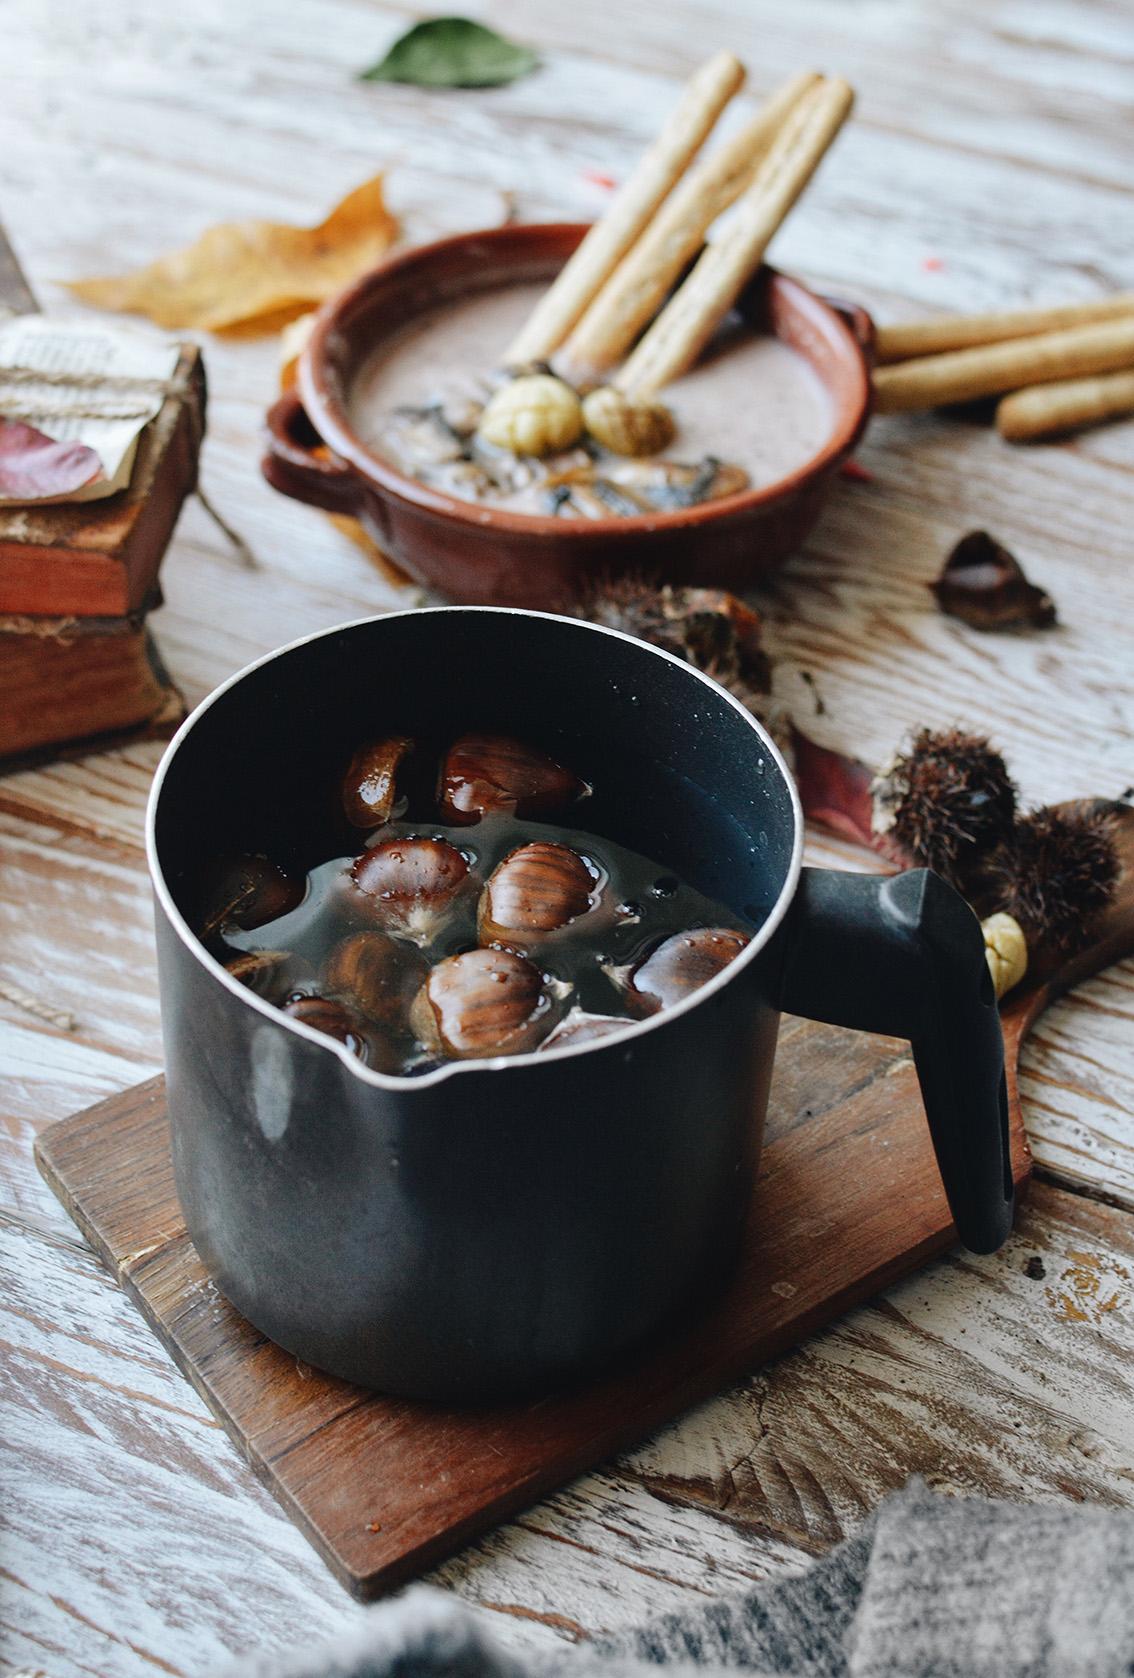 6-1 The perfect seasonal recipe: chestnut and mushroom soup with Pangrì Mulino Bianco.